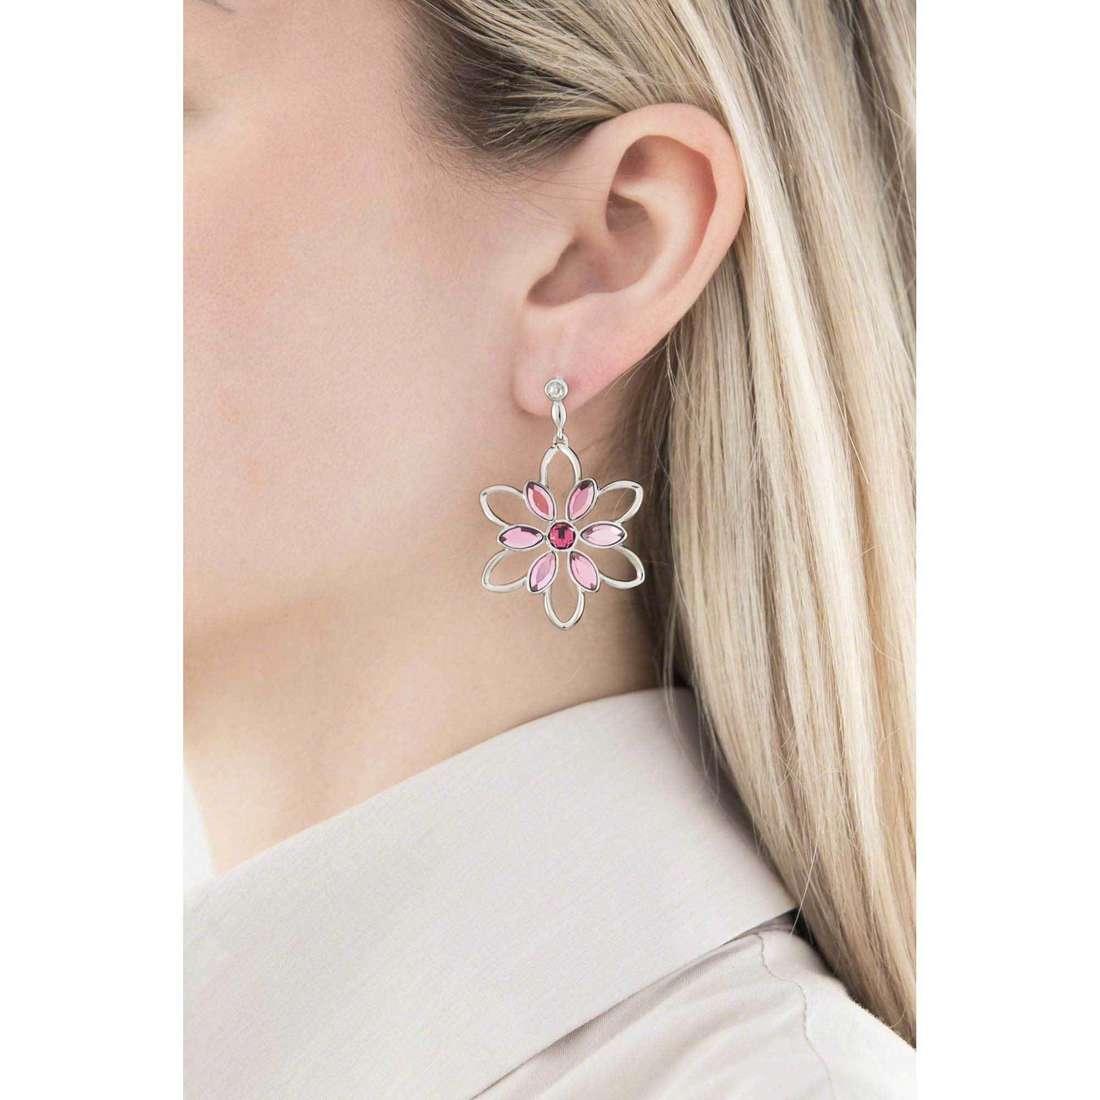 Morellato boucles d'oreille Fioremio femme SABK12 indosso